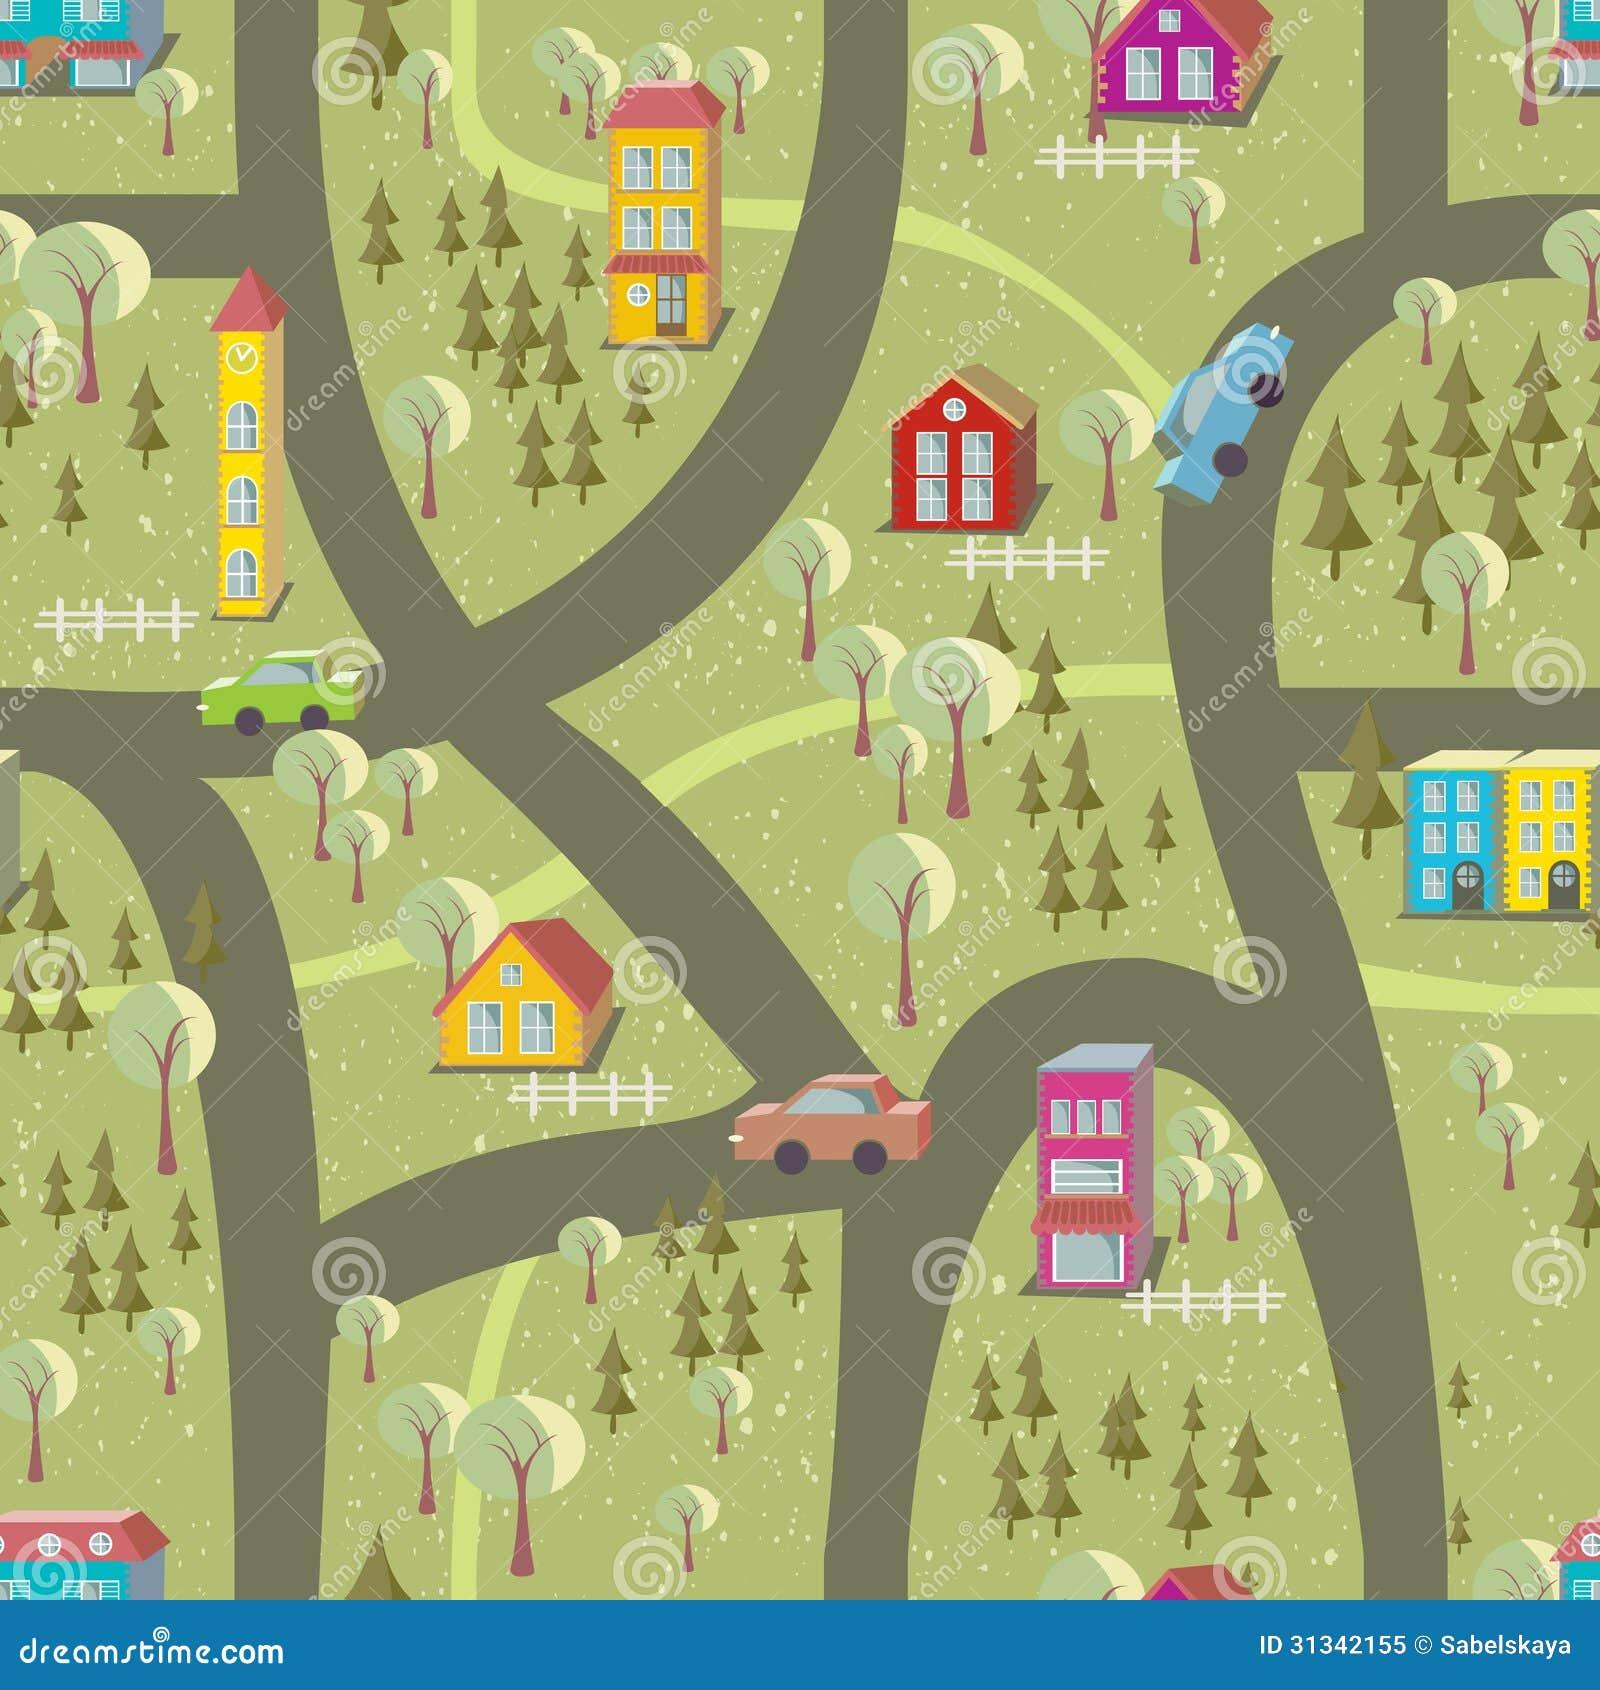 Cartoon Map Seamless Pattern 2 Royalty Free Stock Photo